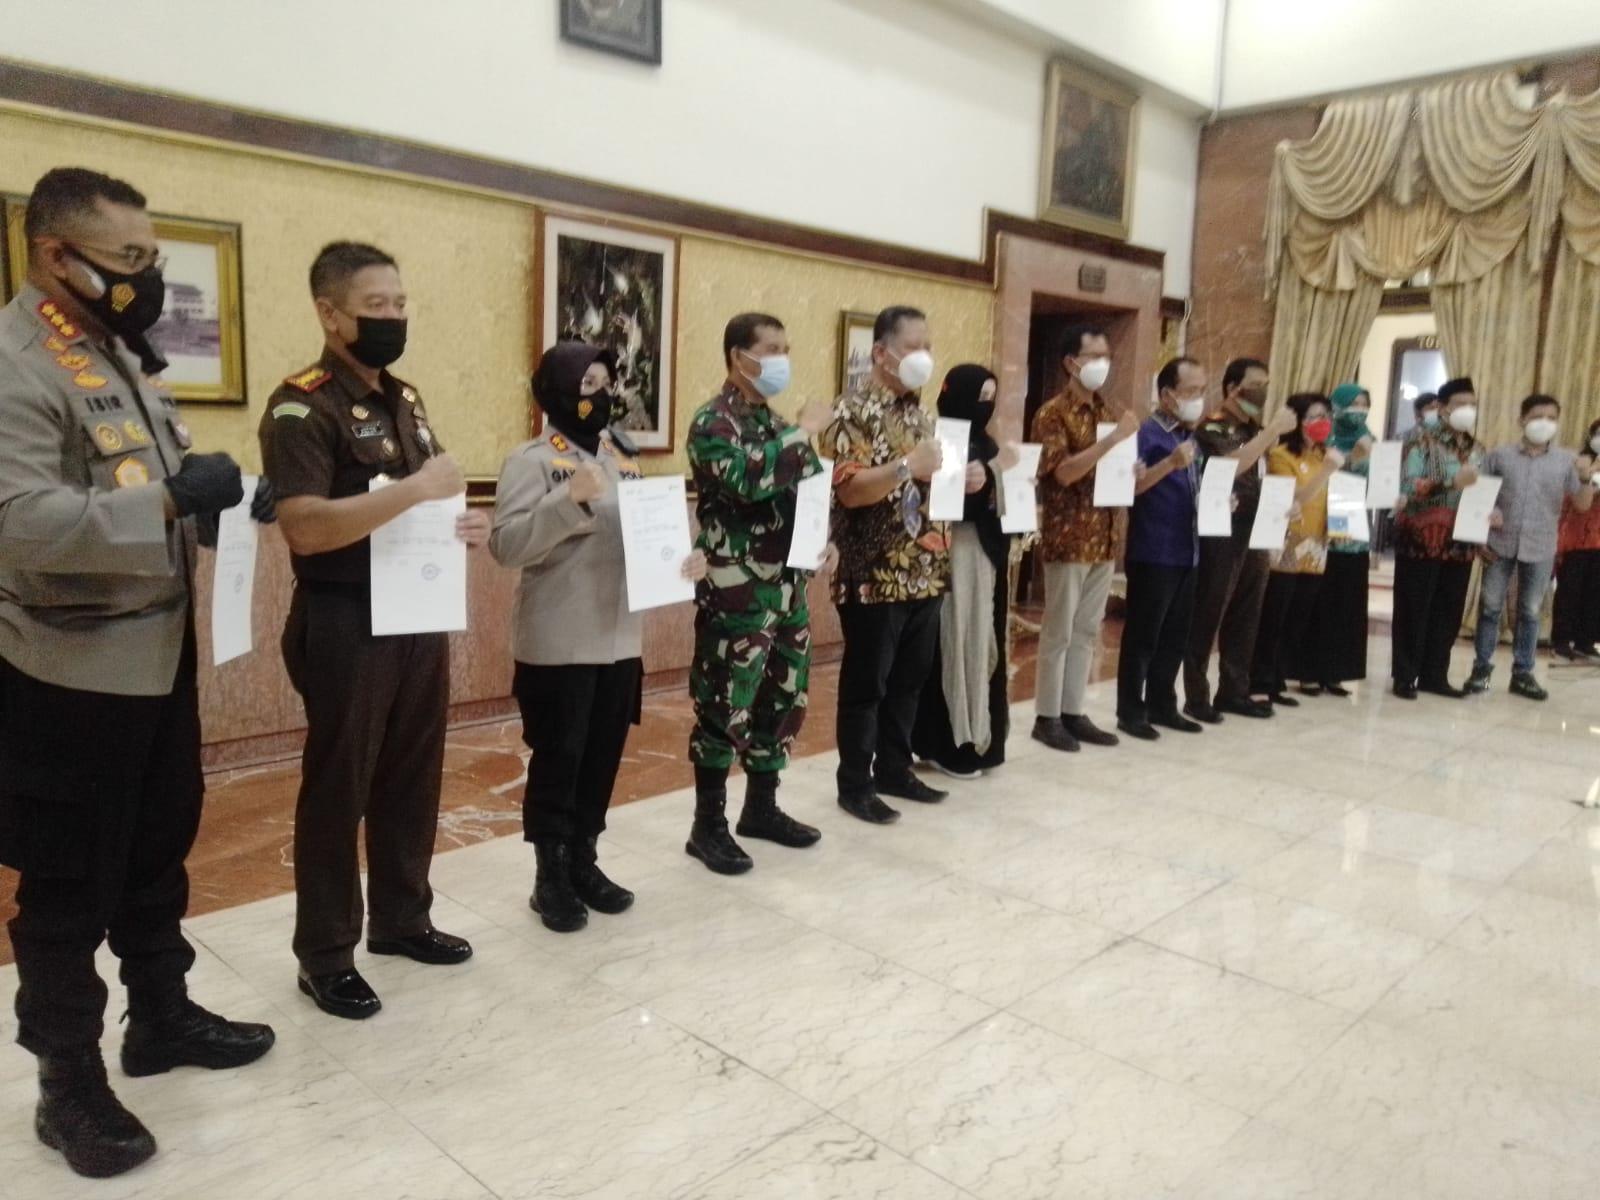 Sebanyak 16 penerima vaksin sinovac tahap kedua yang terdiri dari jajaran forkopimda dan tokoh masyarakat pada Jumat (29/01/2021), di Balai Kota Surabaya. Untuk kalangan menengah ke atas diharapkan bisa vaksinasi secara mandiri. (Foto: Rangga Aji/Tugu Malang)